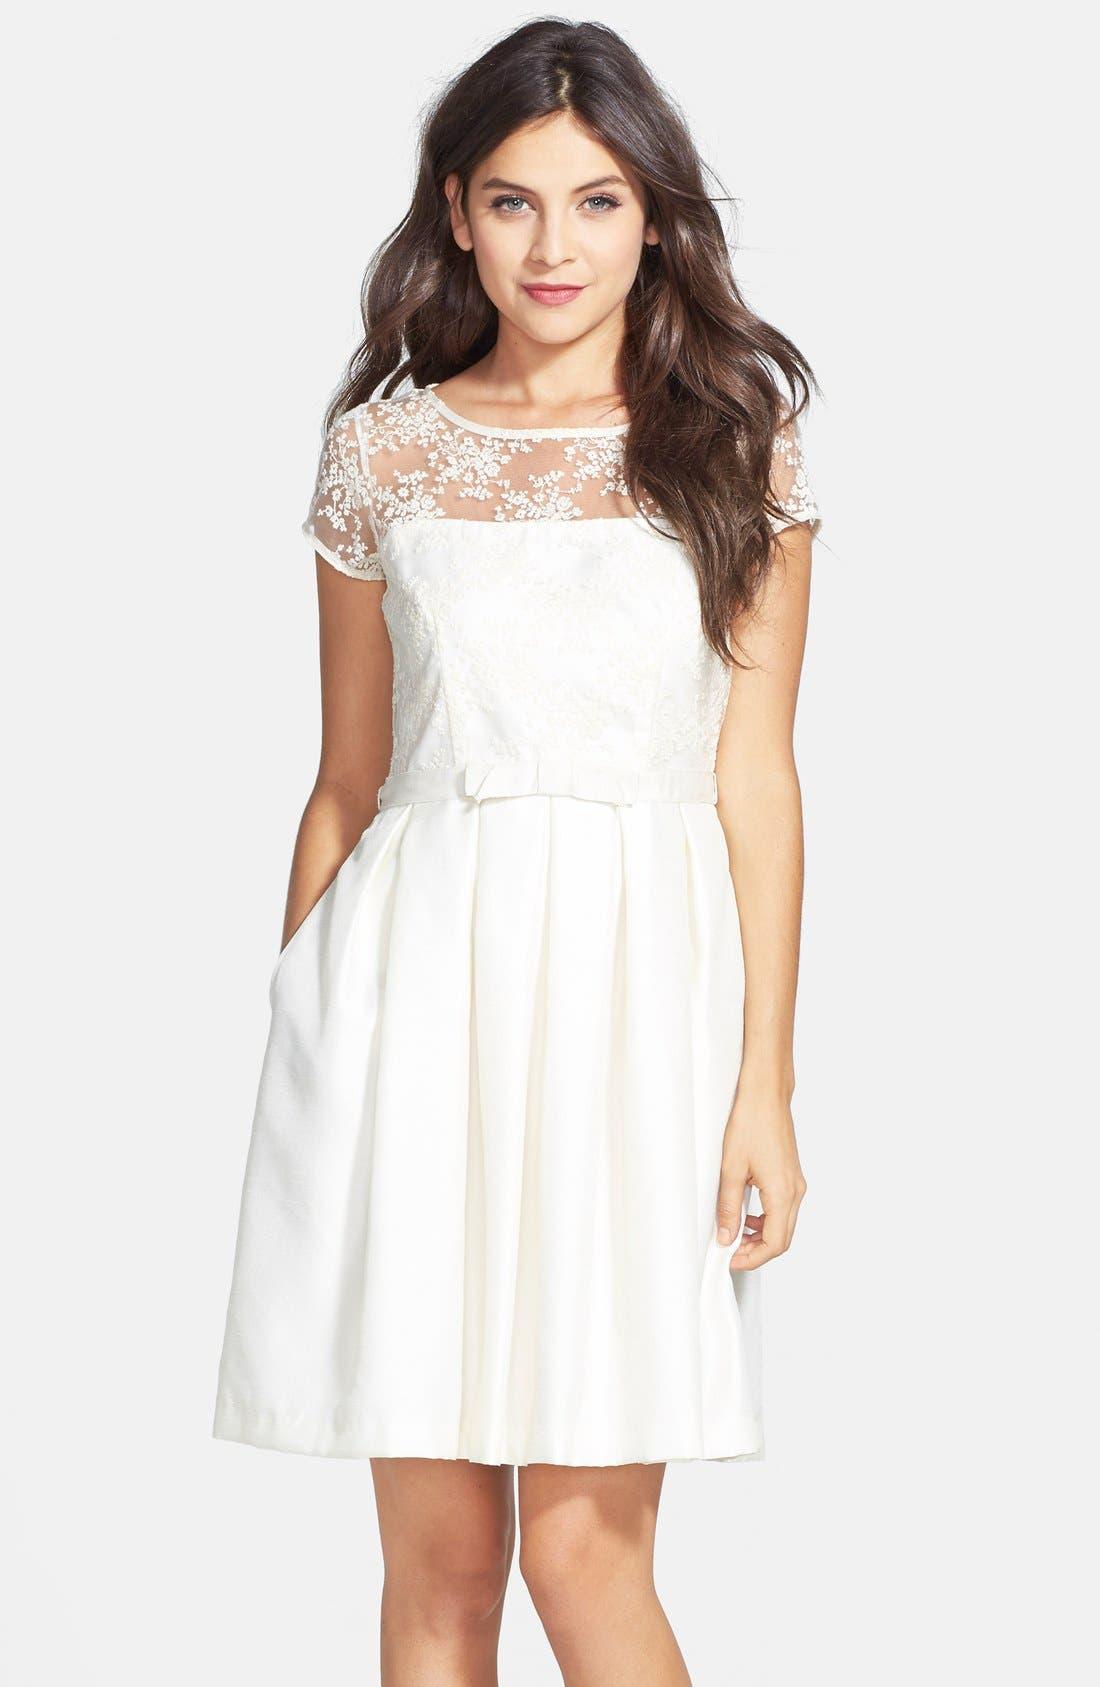 Alternate Image 1 Selected - Taylor Dresses Illusion Yoke Shantung Fit & Flare Dress